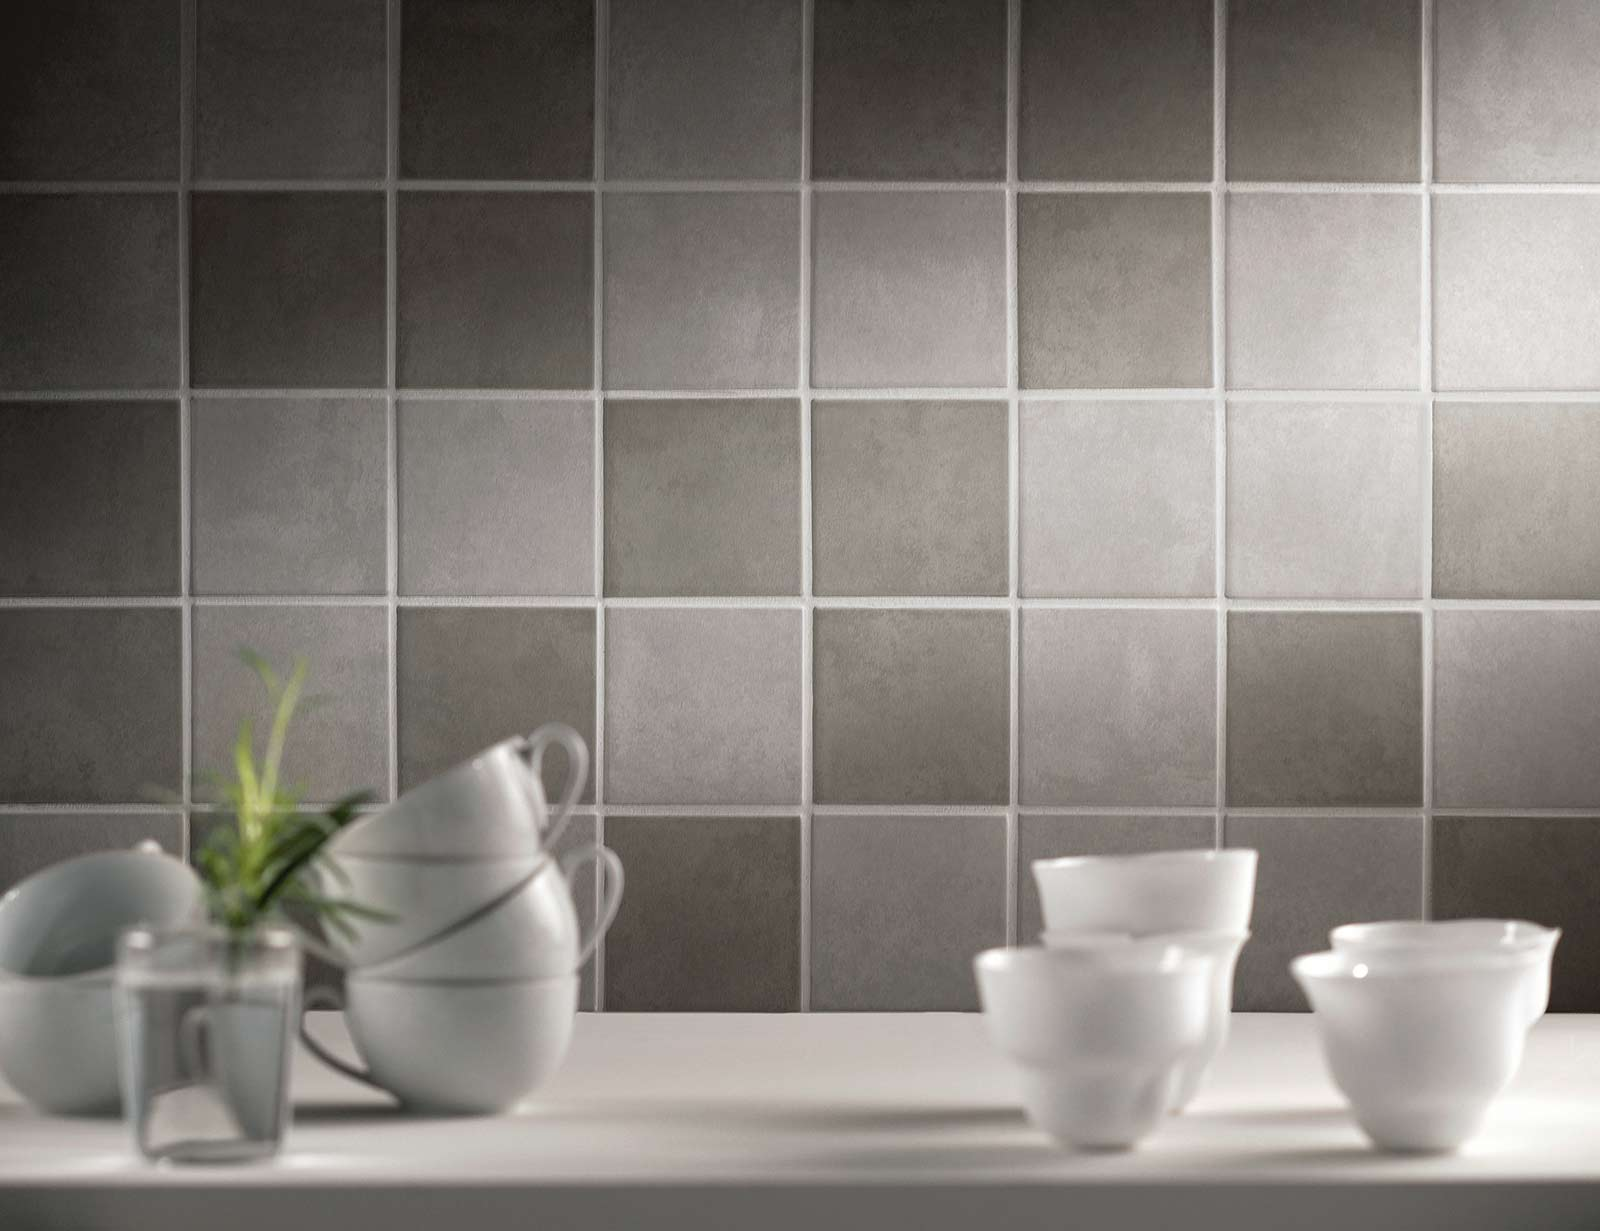 Progress natural effect porcelain stoneware marazzi - Piastrelle 10x10 bagno ...